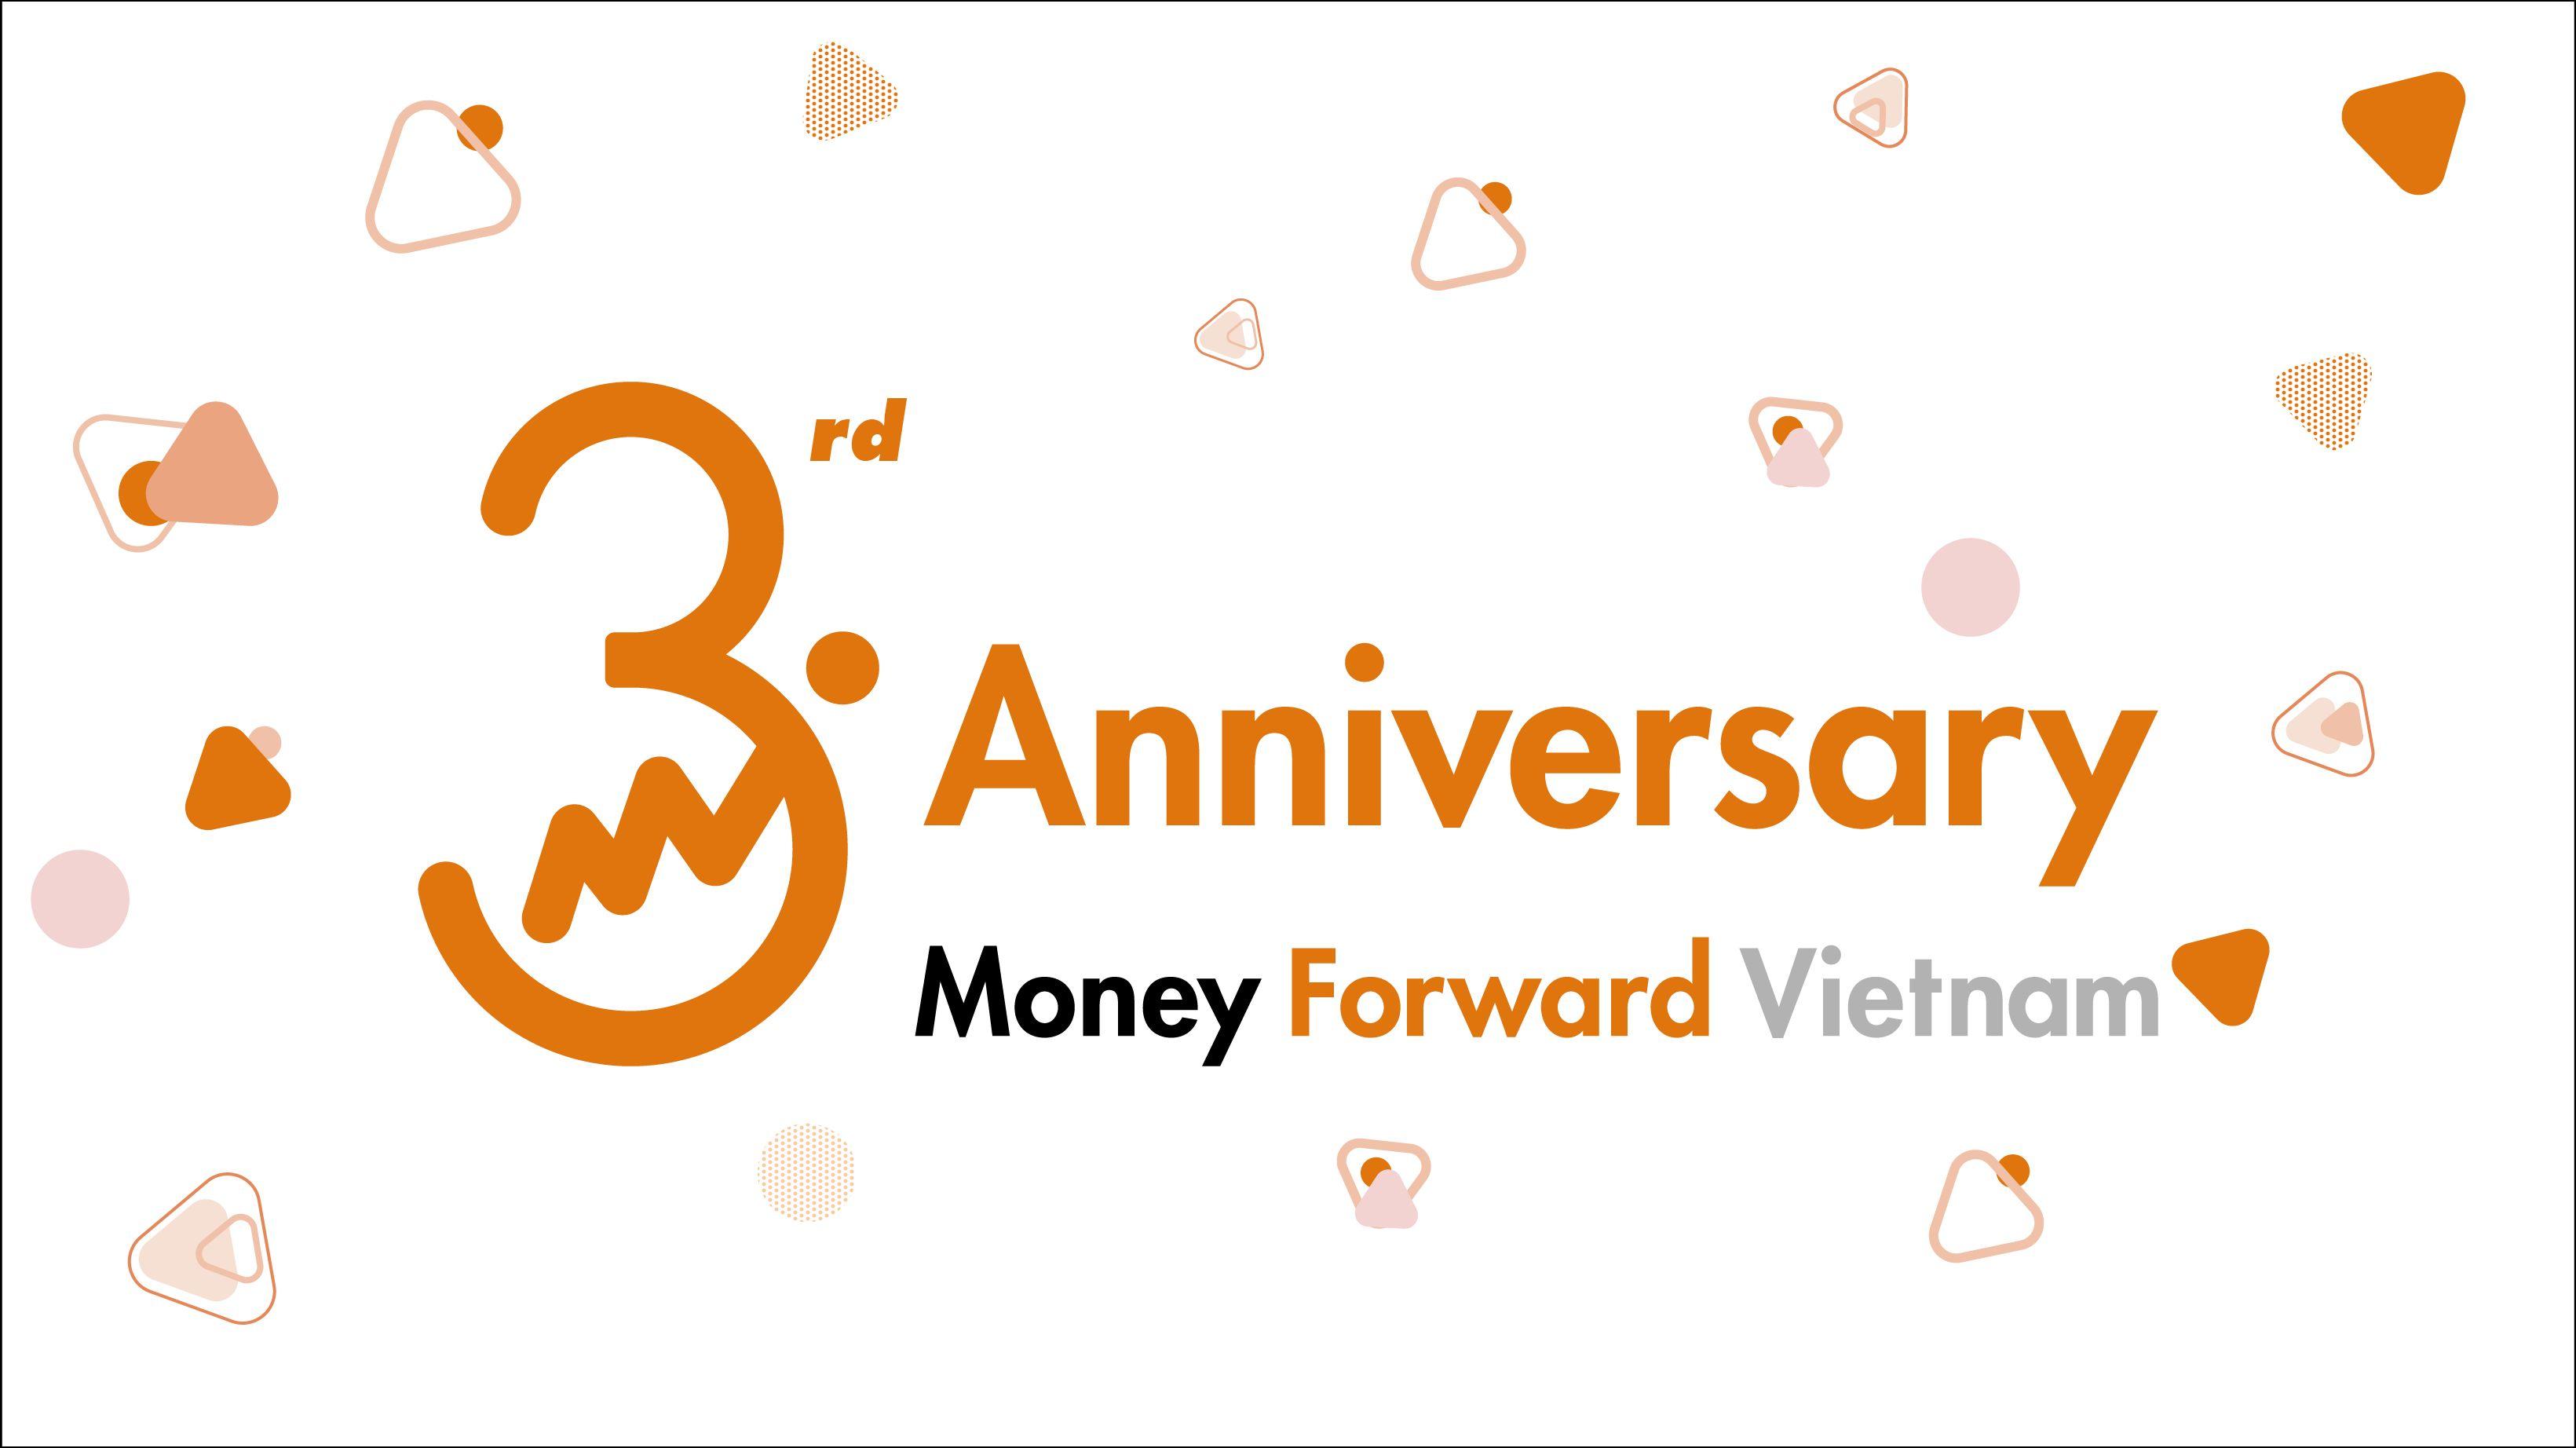 San - Sinh nhật online mừng MFV tròn 3 tuổi